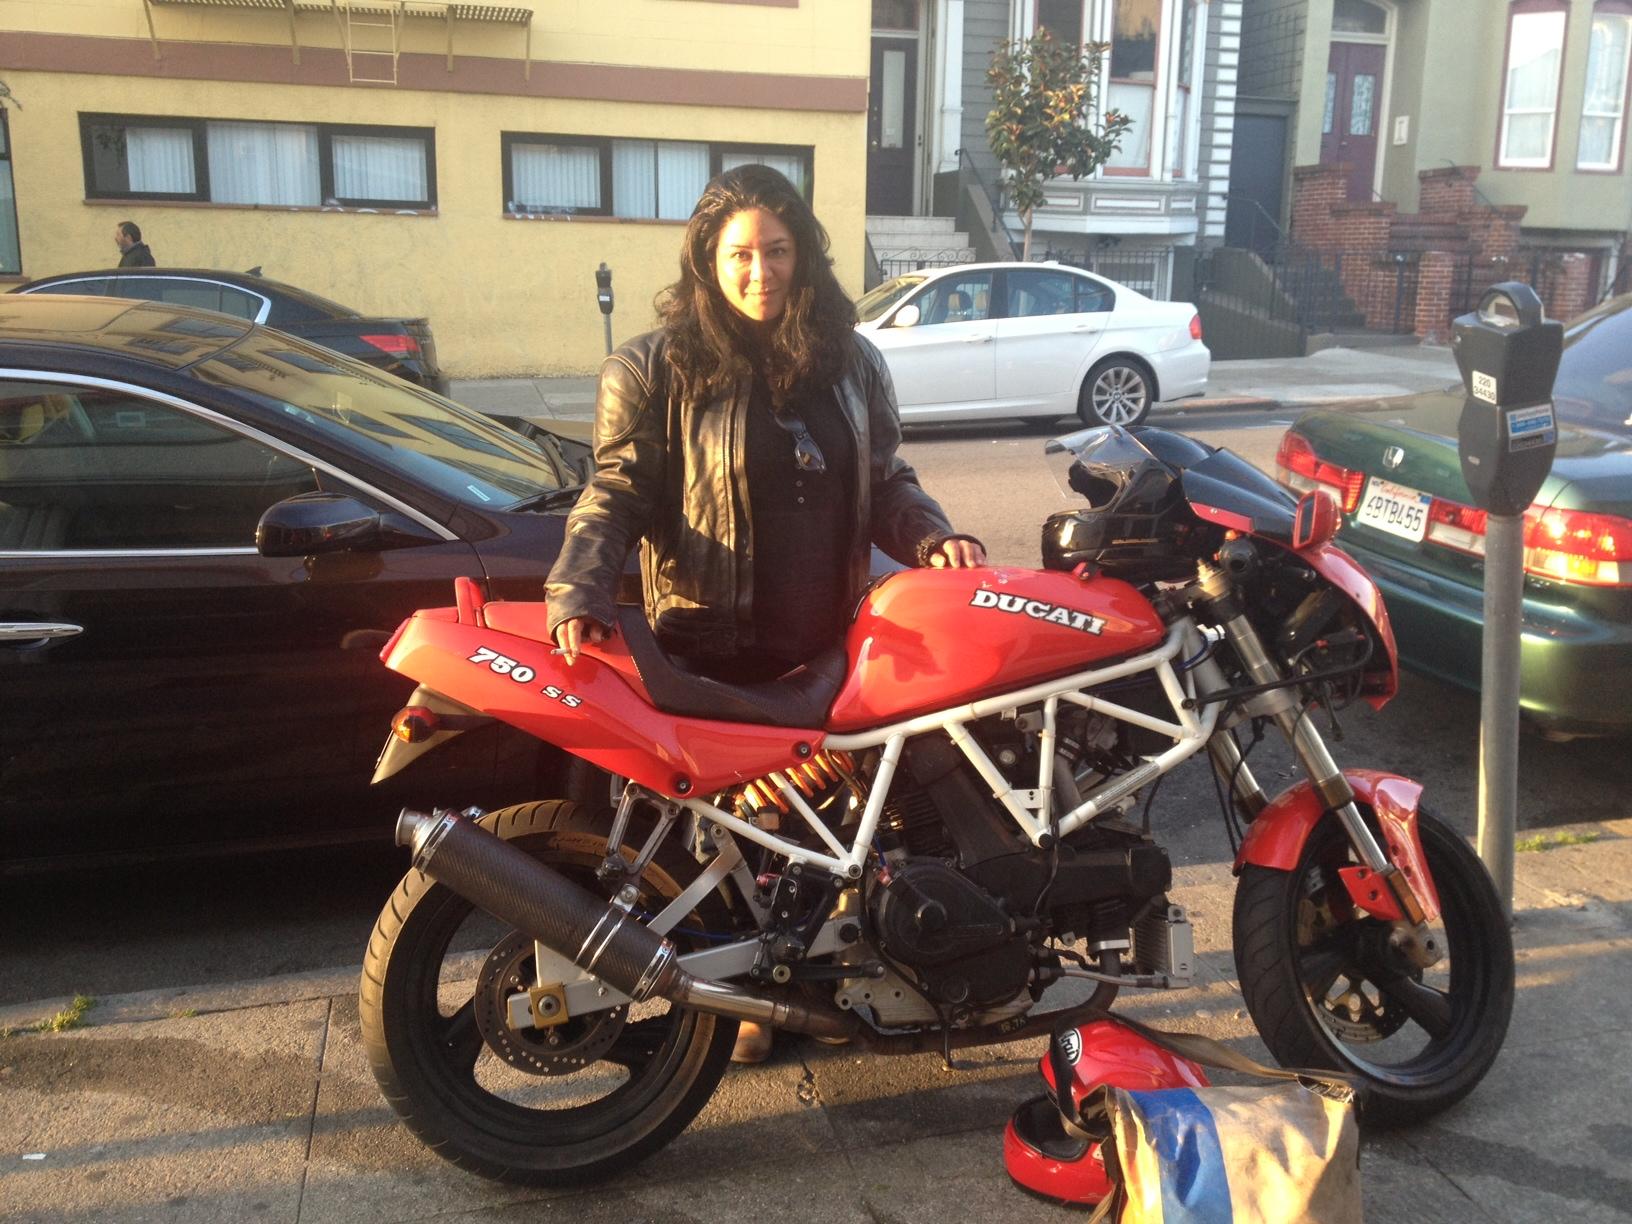 stolen 1992 750ss san francisco $1000 reward - ducati.ms - the